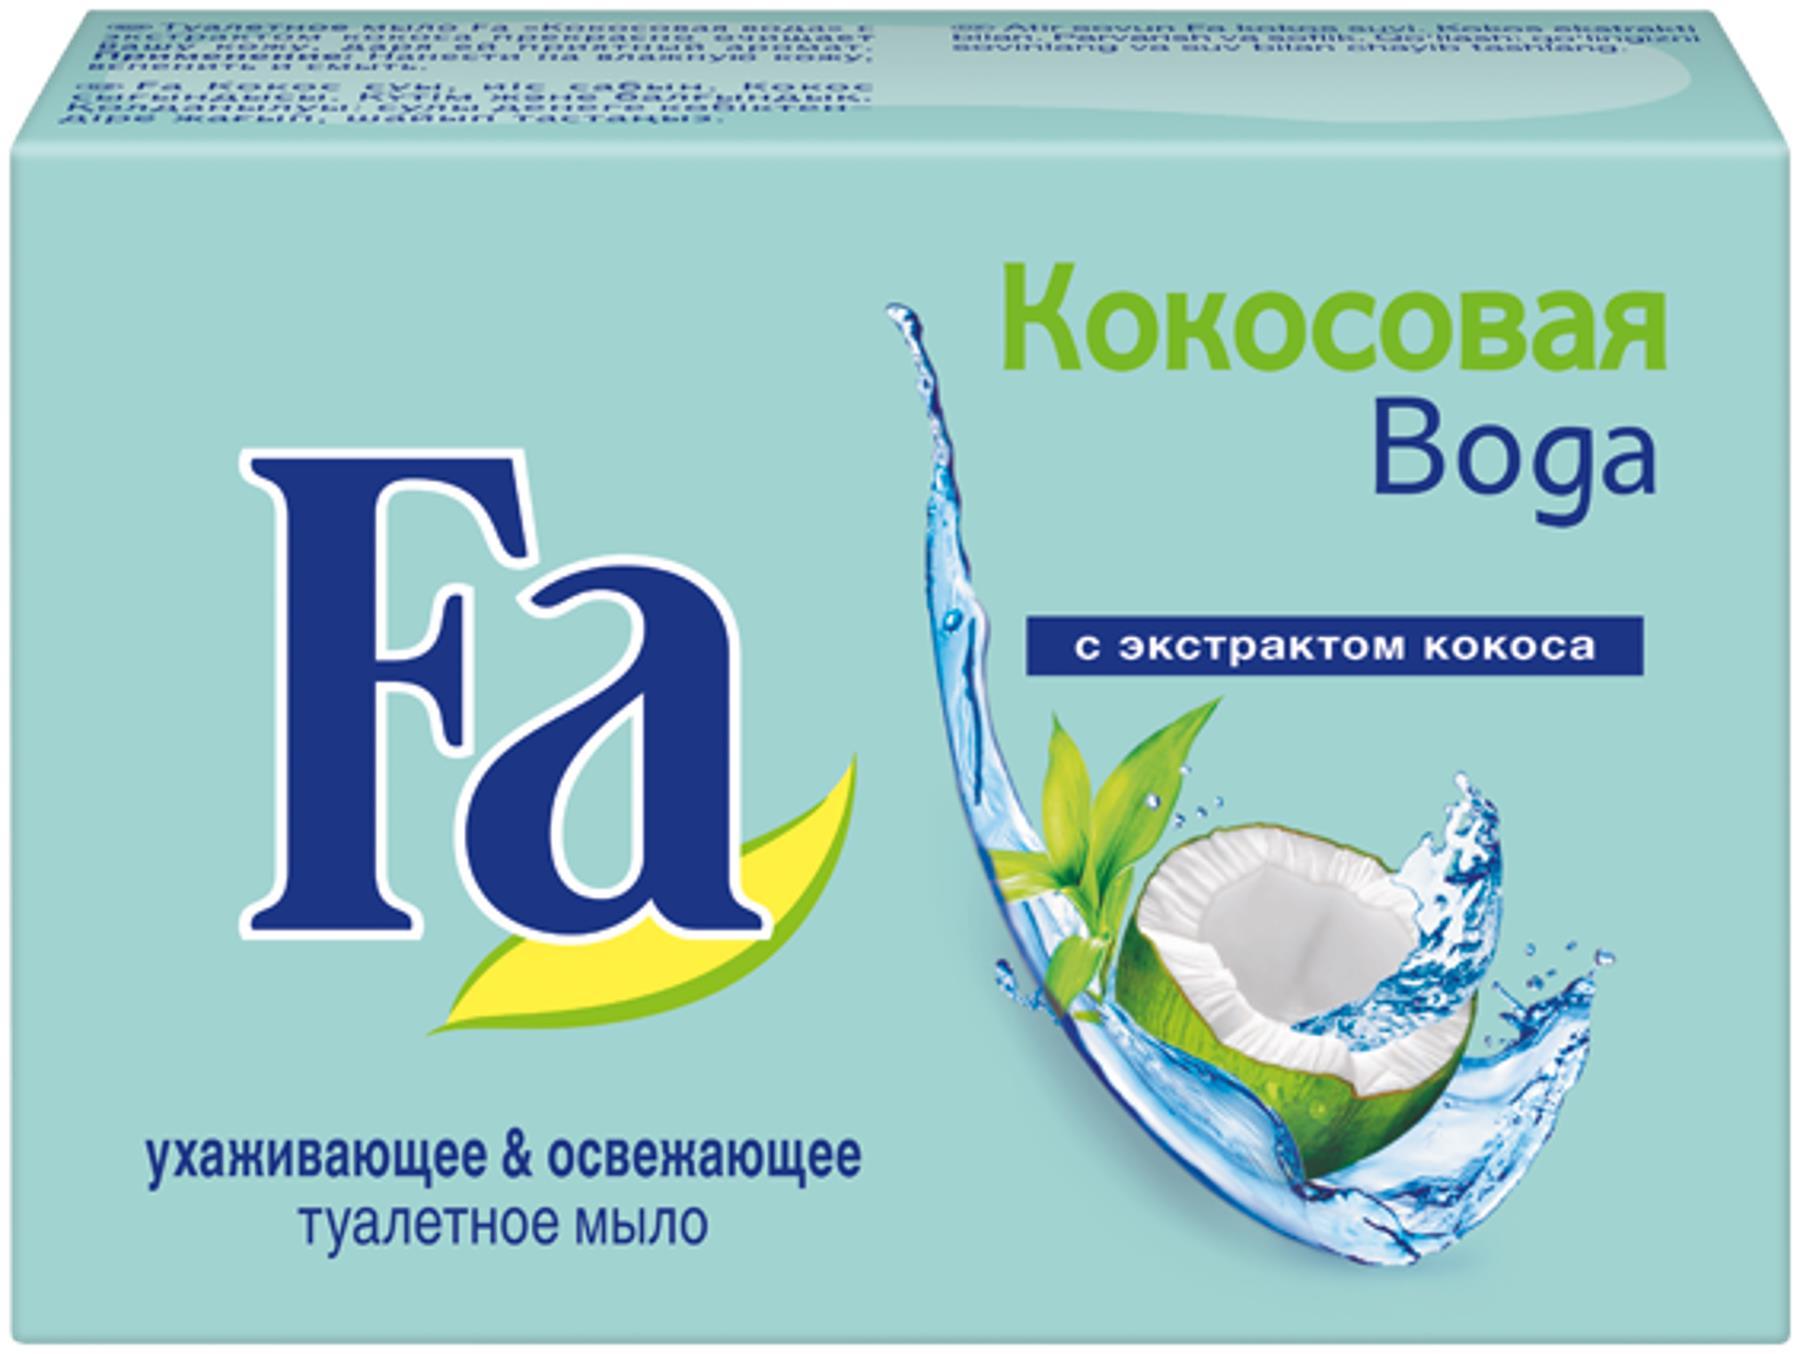 FA Кусковое мыло Кокосовая вода, 90 г тушь для ресниц victoria shu the best one extreme volume